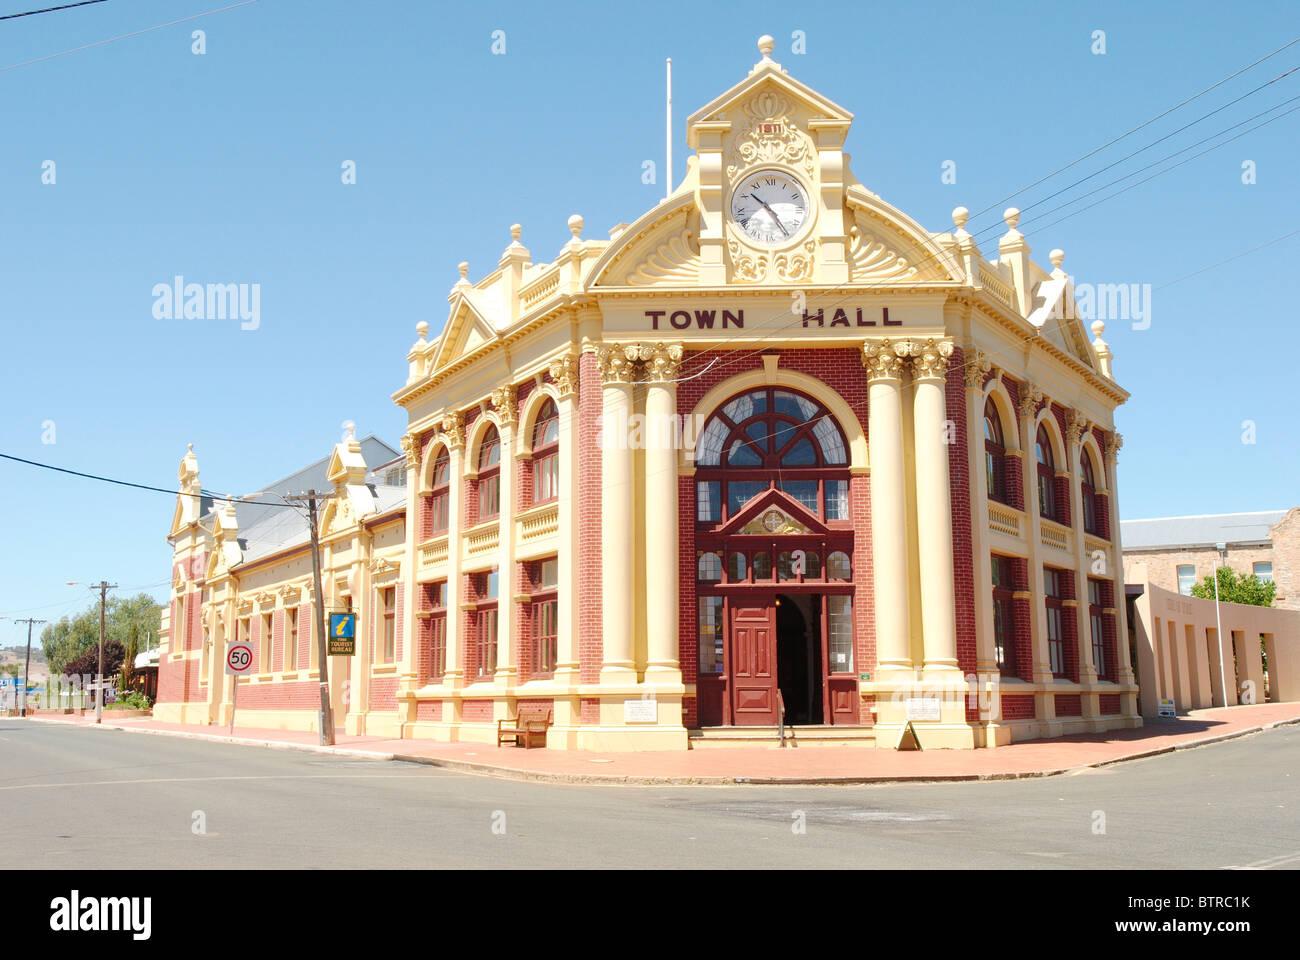 Australia, Australasia, Western Australia, York, Building Exterior - Stock Image